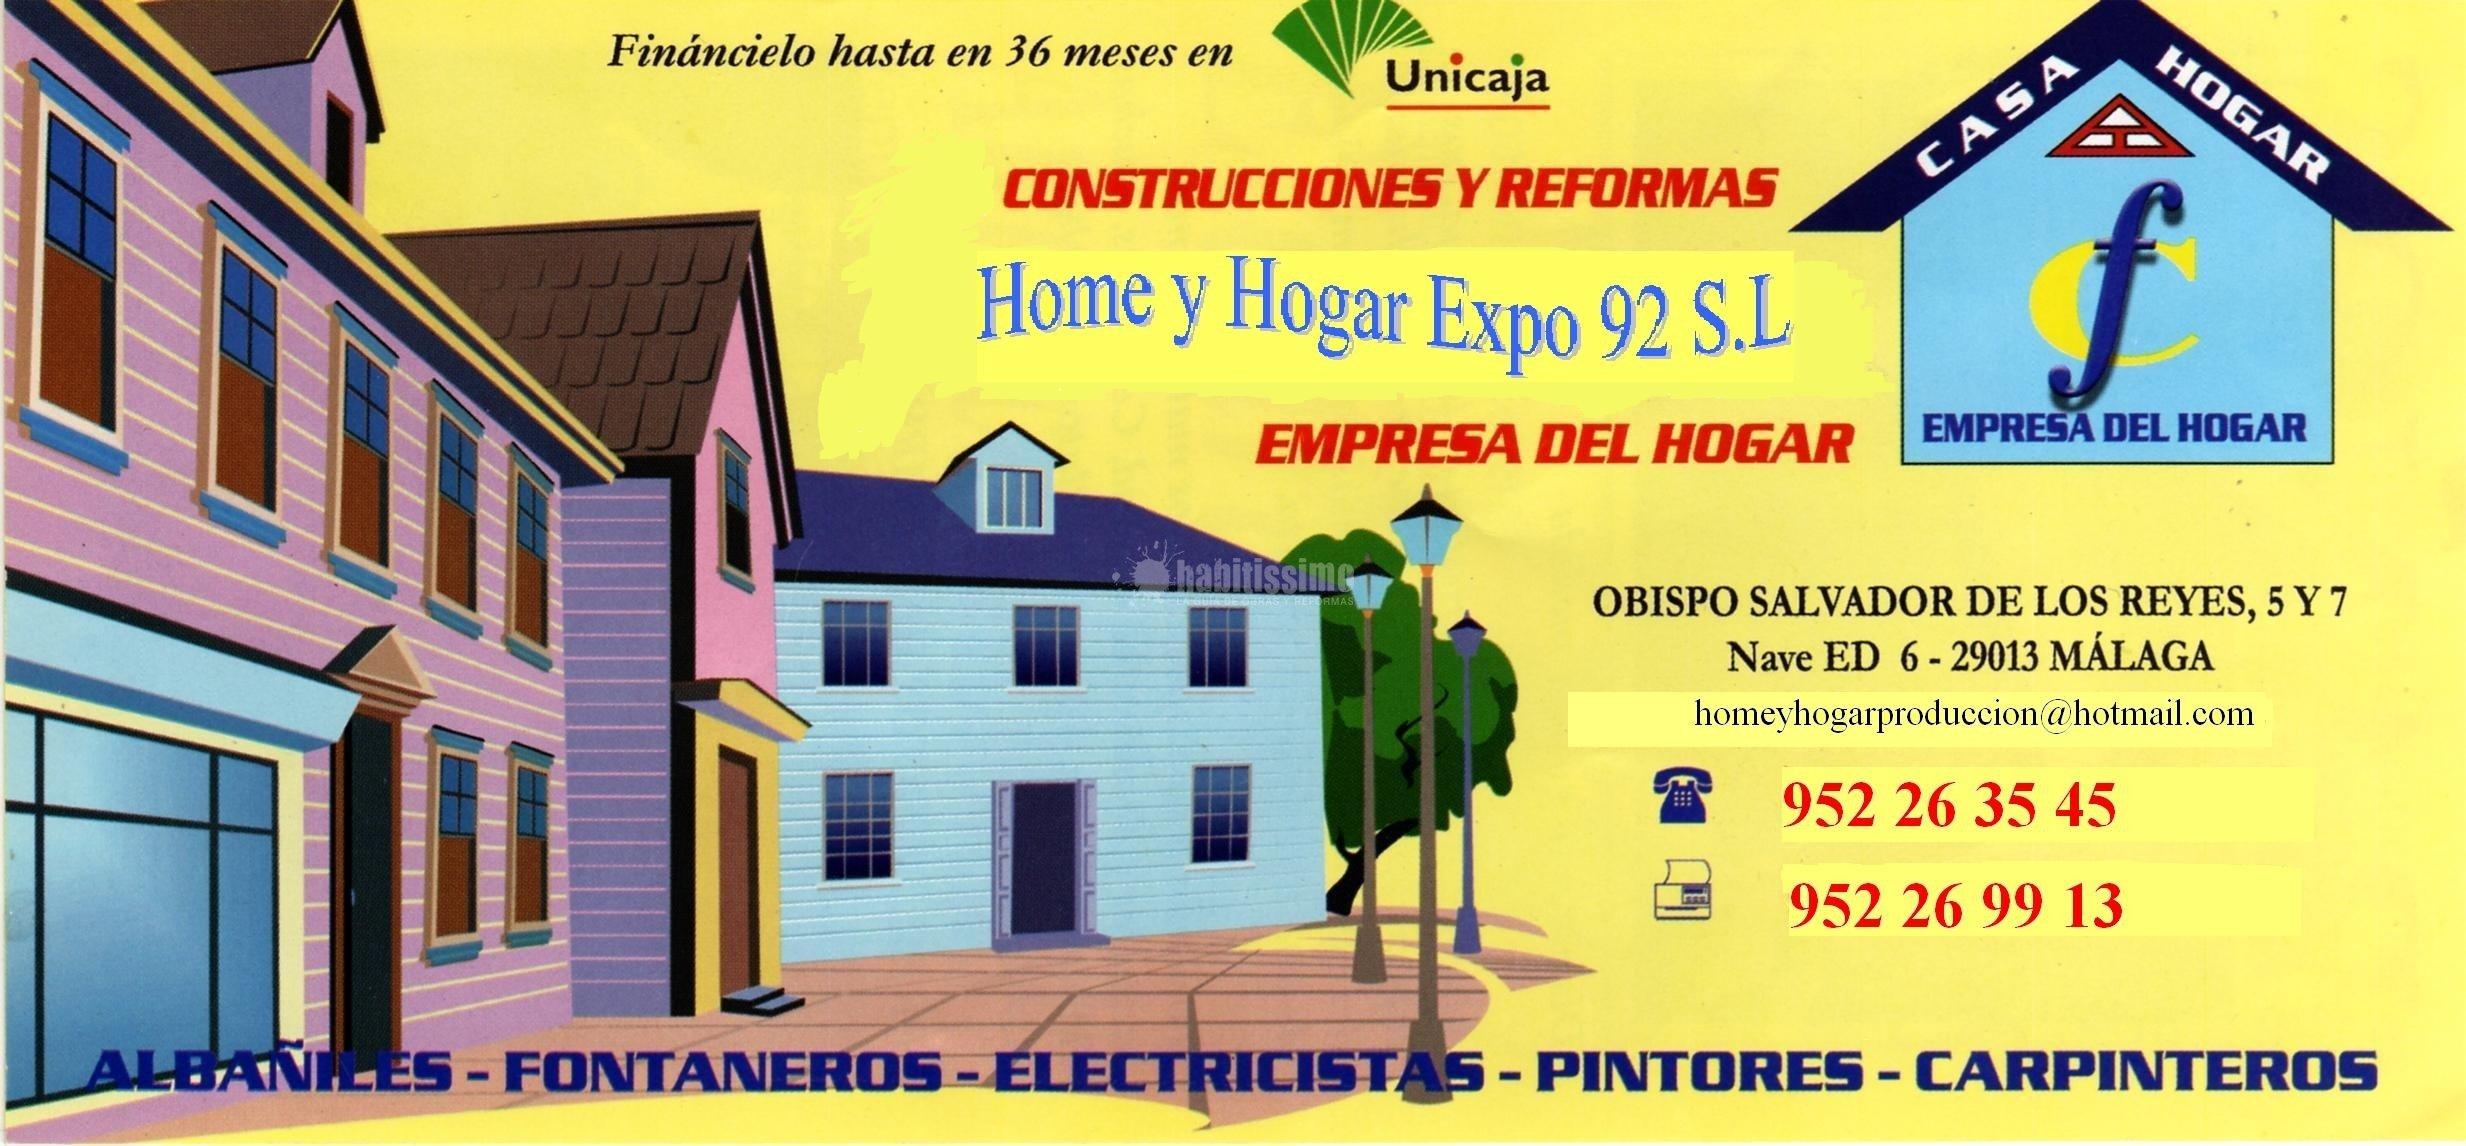 Home y Hogar Expo 92 S.L.